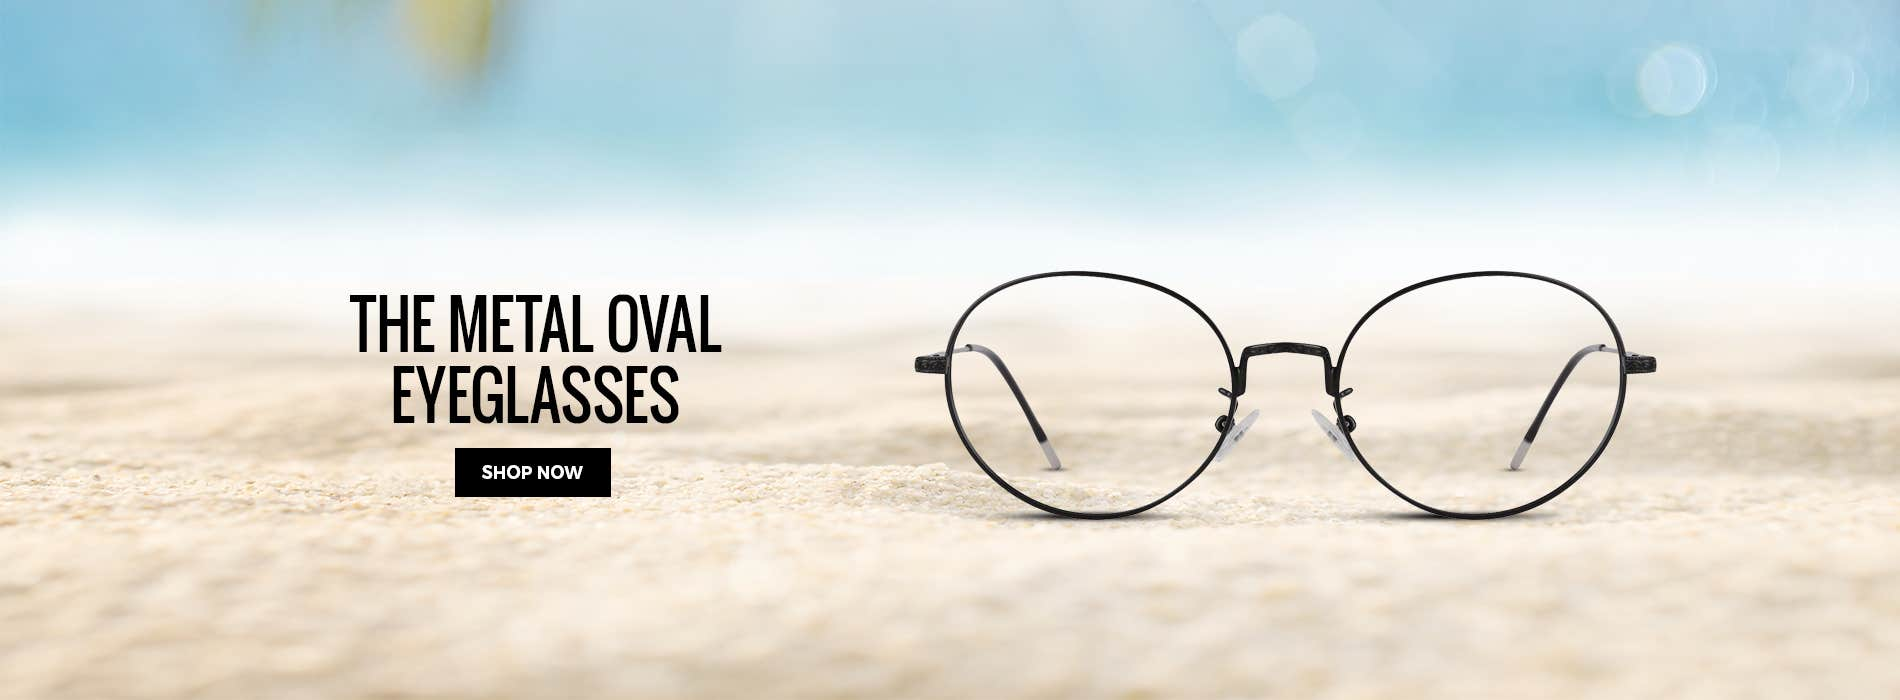 The Metal Oval Eyeglasses